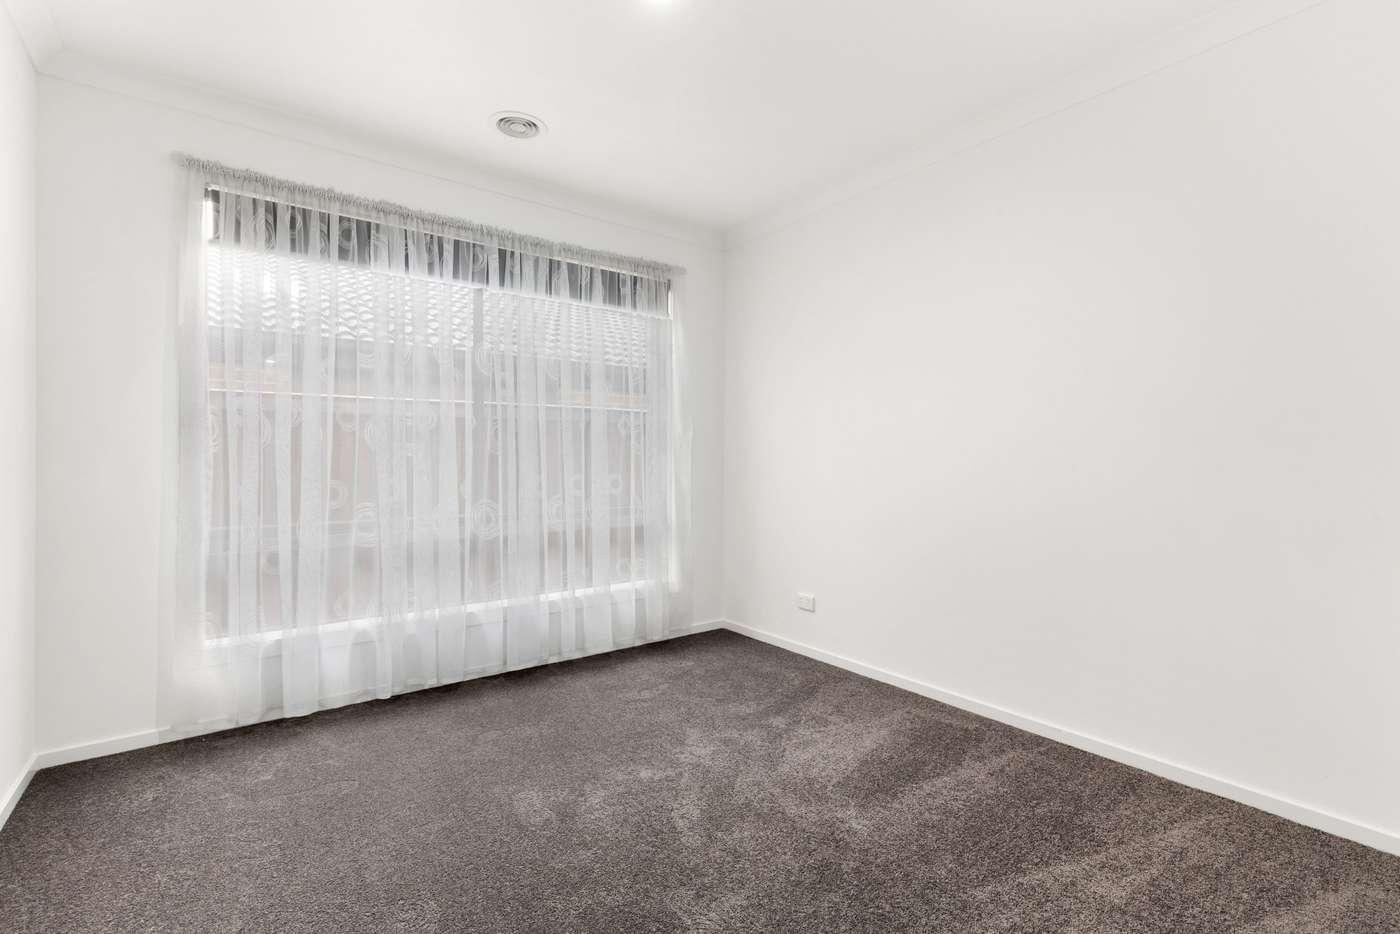 Seventh view of Homely house listing, 47 Rockford Street, Pakenham VIC 3810